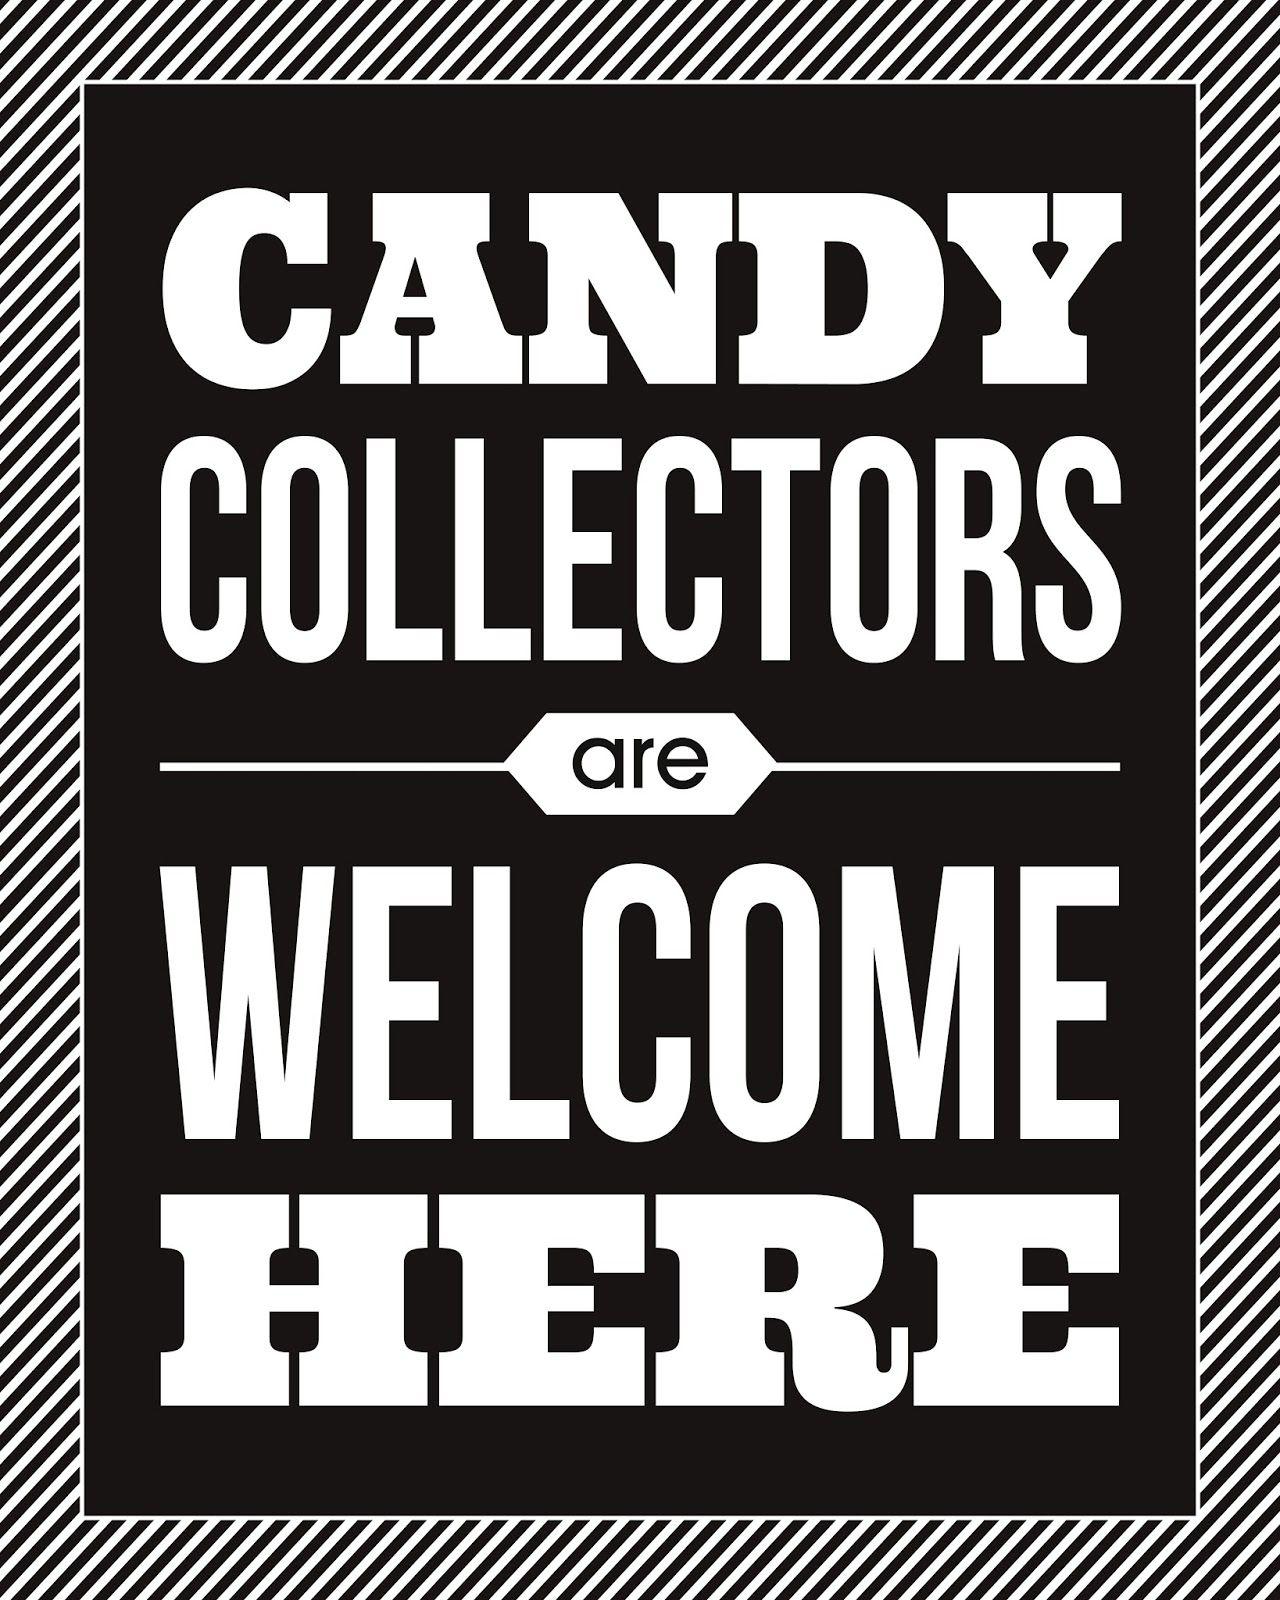 Candy Collectors Halloween Print Halloween prints